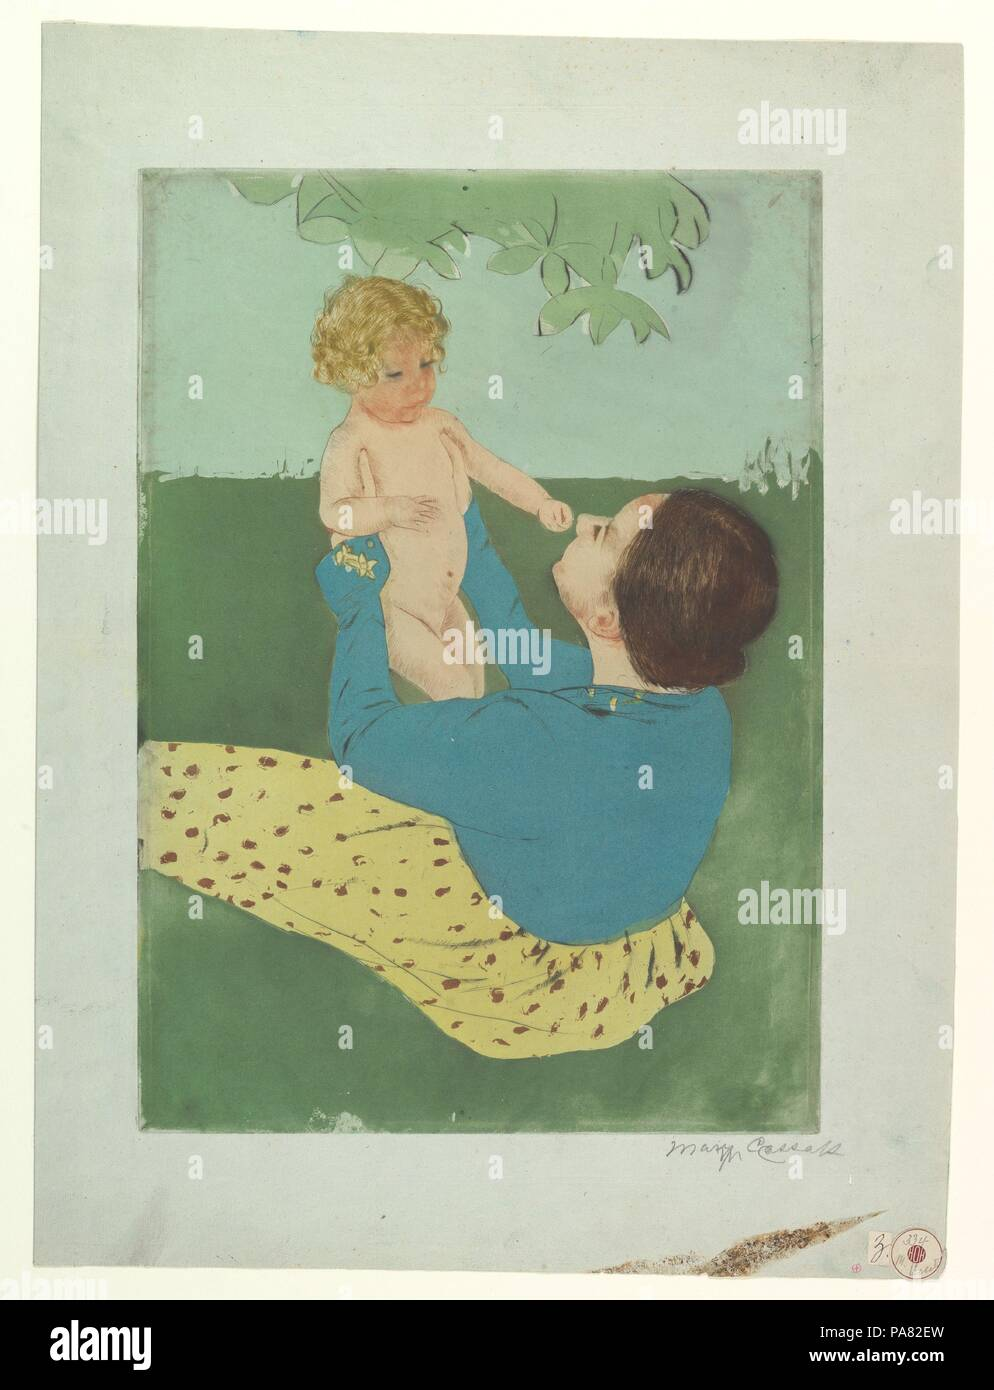 Under the Horse Chestnut Tree. Artist: Mary Cassatt (American, Pittsburgh, Pennsylvania 1844-1926 Le Mesnil-Théribus, Oise). Dimensions: plate: 15 15/16 x 11 3/16 in. (40.5 x 28.4 cm)  sheet: 20 1/2 x 15 3/16 in. (52.1 x 38.6 cm). Date: 1896-97. Museum: Metropolitan Museum of Art, New York, USA. Stock Photo